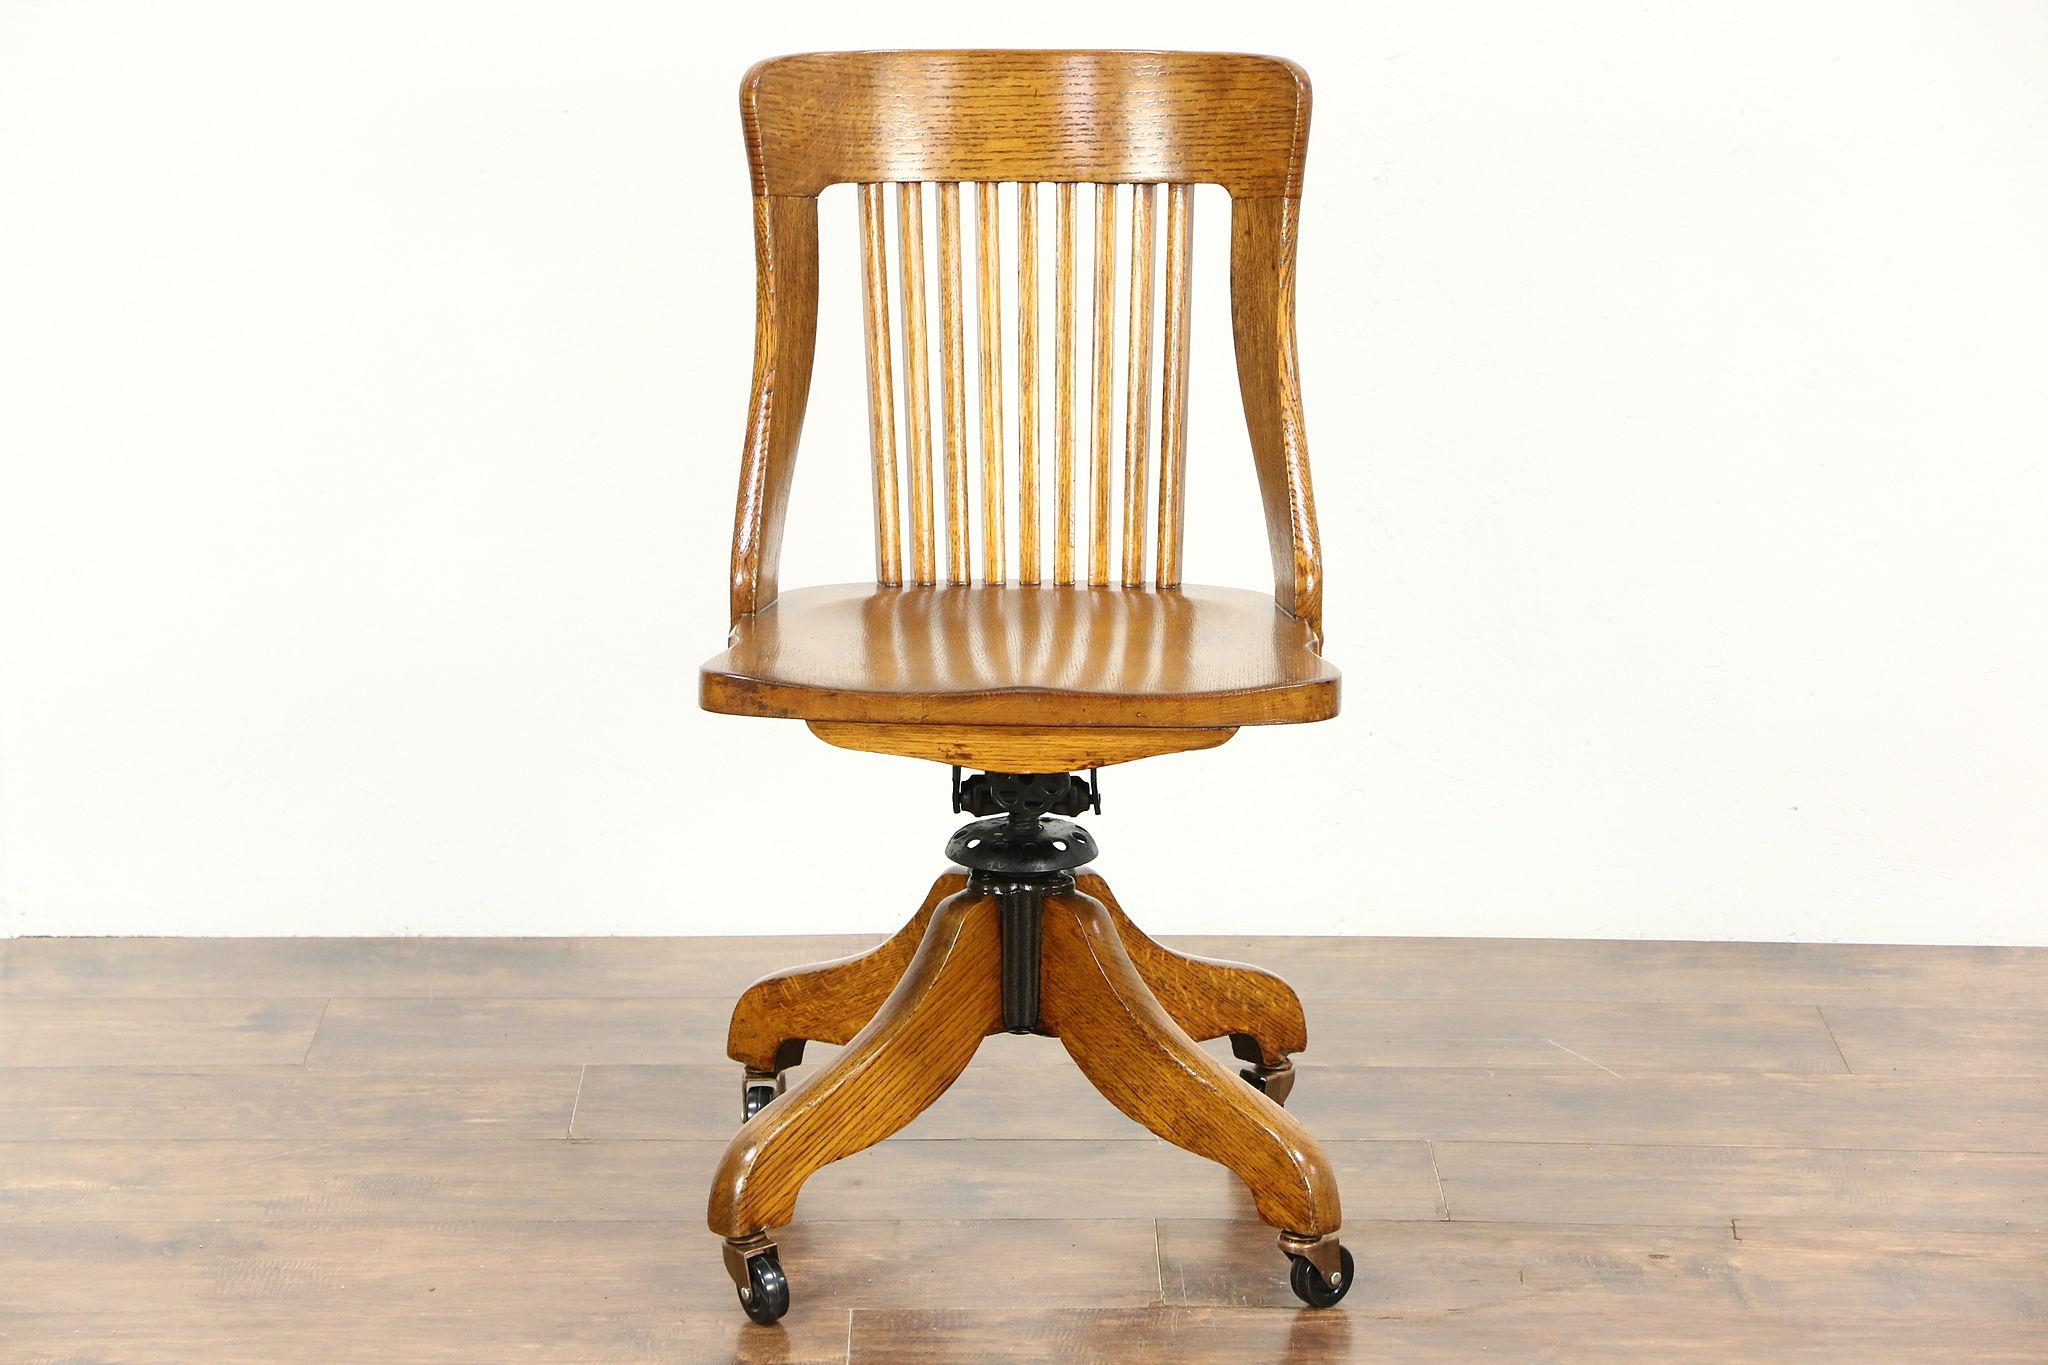 Oak 1910 Antique Swivel Adjule Desk Chair Signed Sheboygan Wi